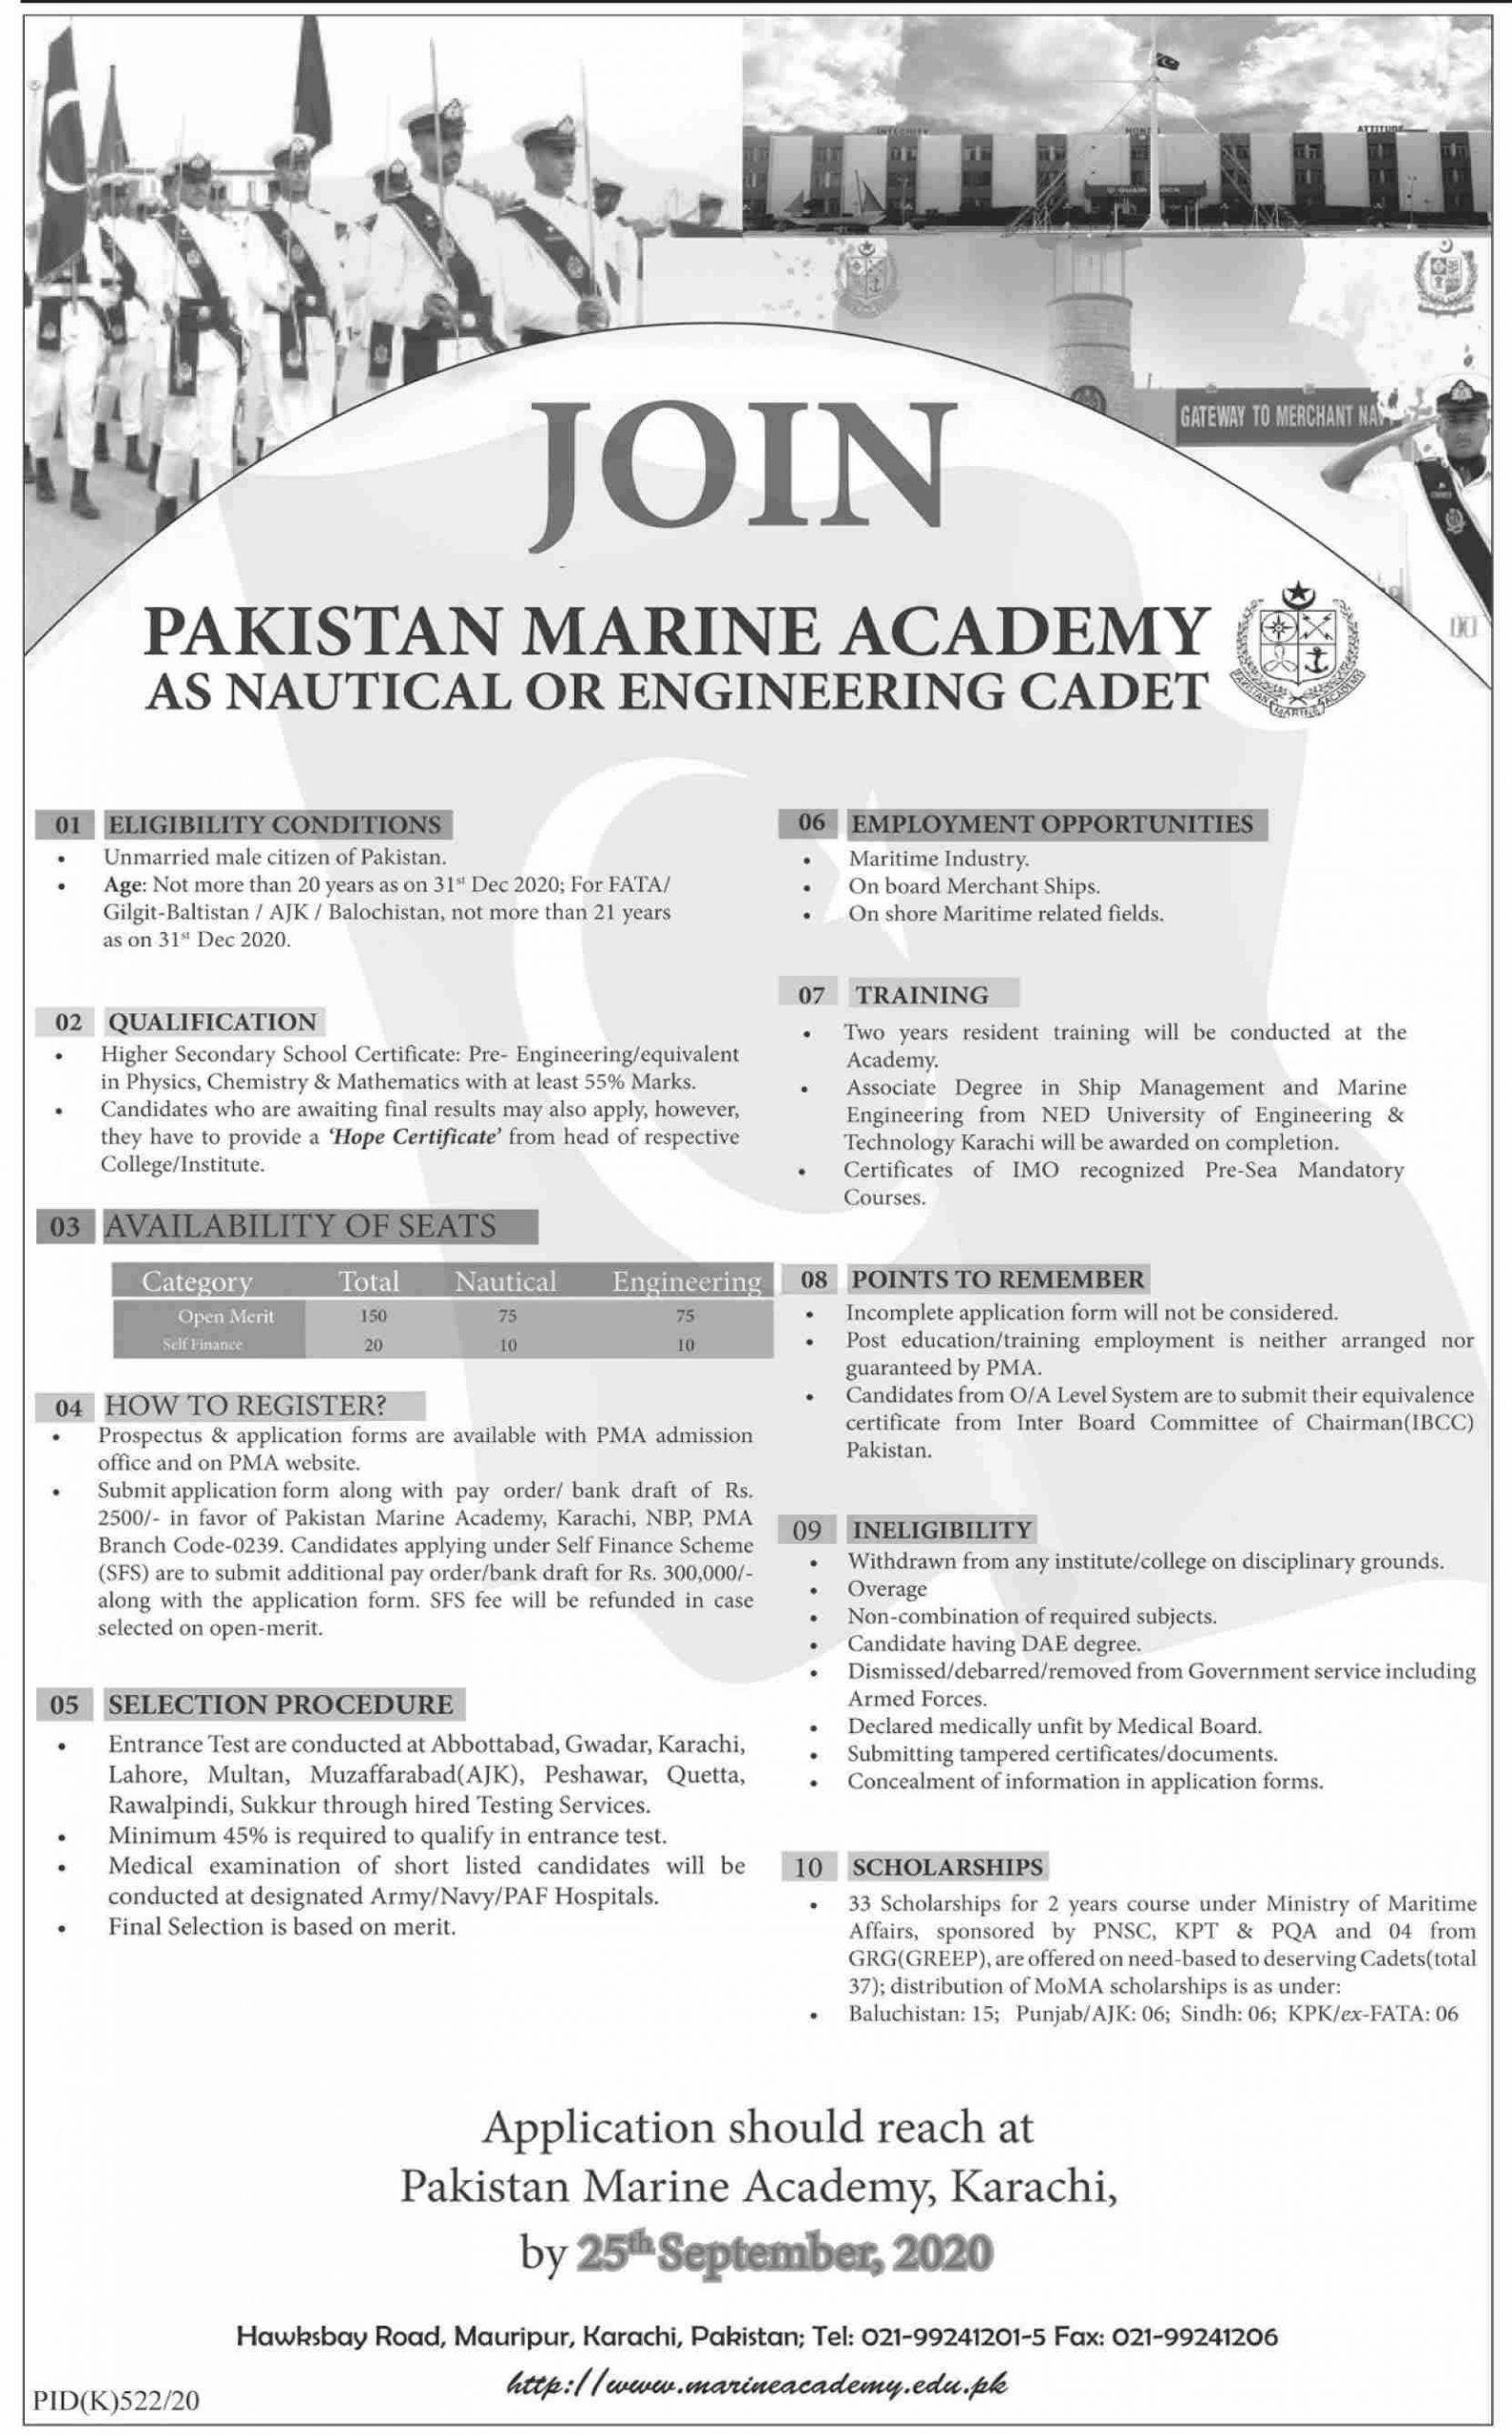 Nautical Engineer Cadet